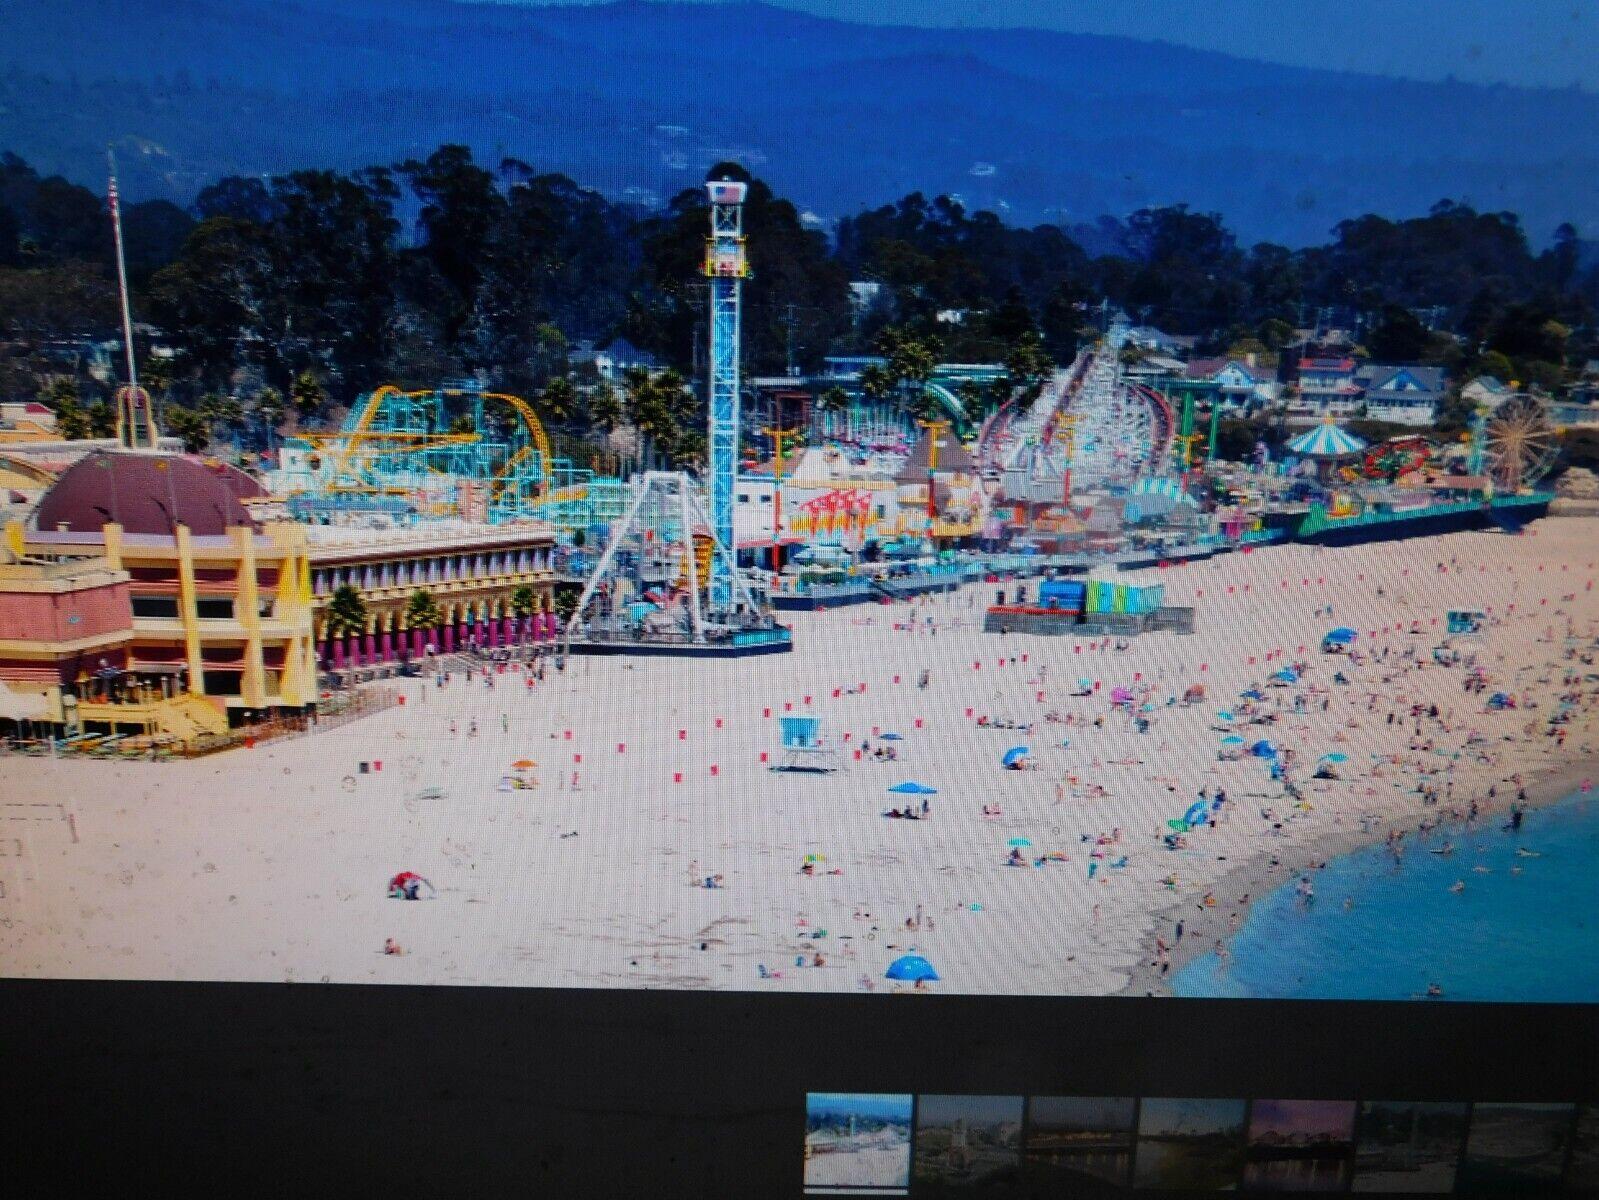 Cabin lot in Santa Cruz County, CA. Eleven Miles from the ocean $3,000